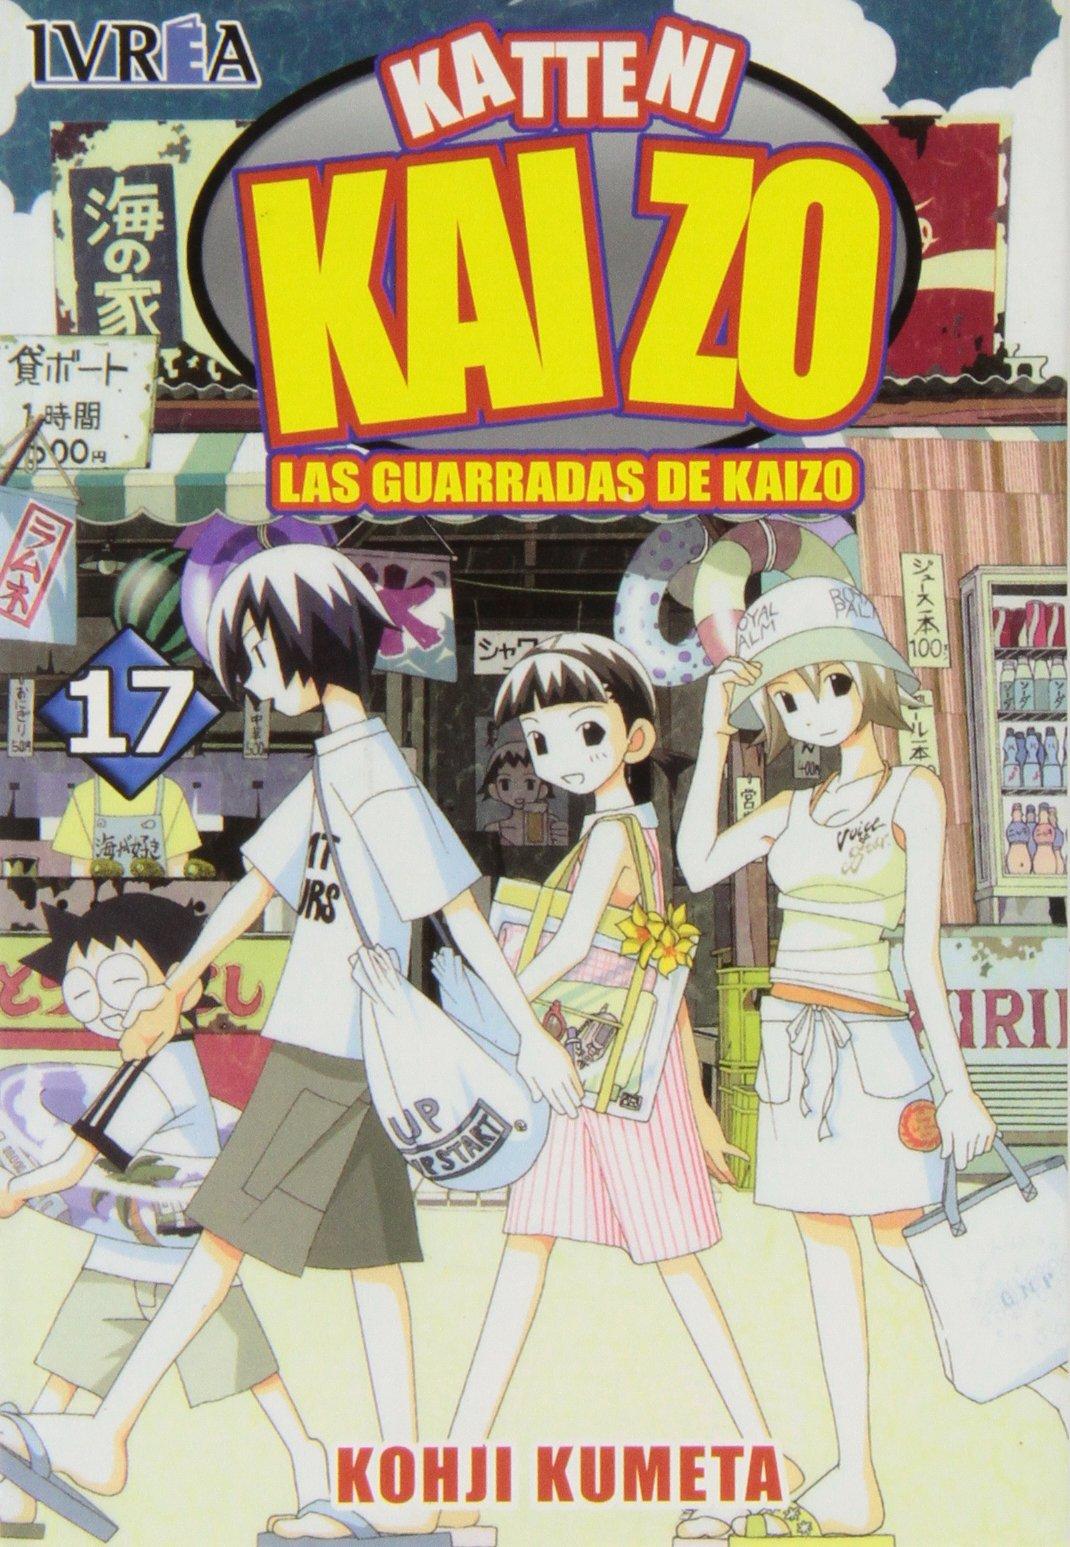 Read Online Las Guarradas De Kaizo 17 / The mess of Kaizo (Spanish Edition) ebook